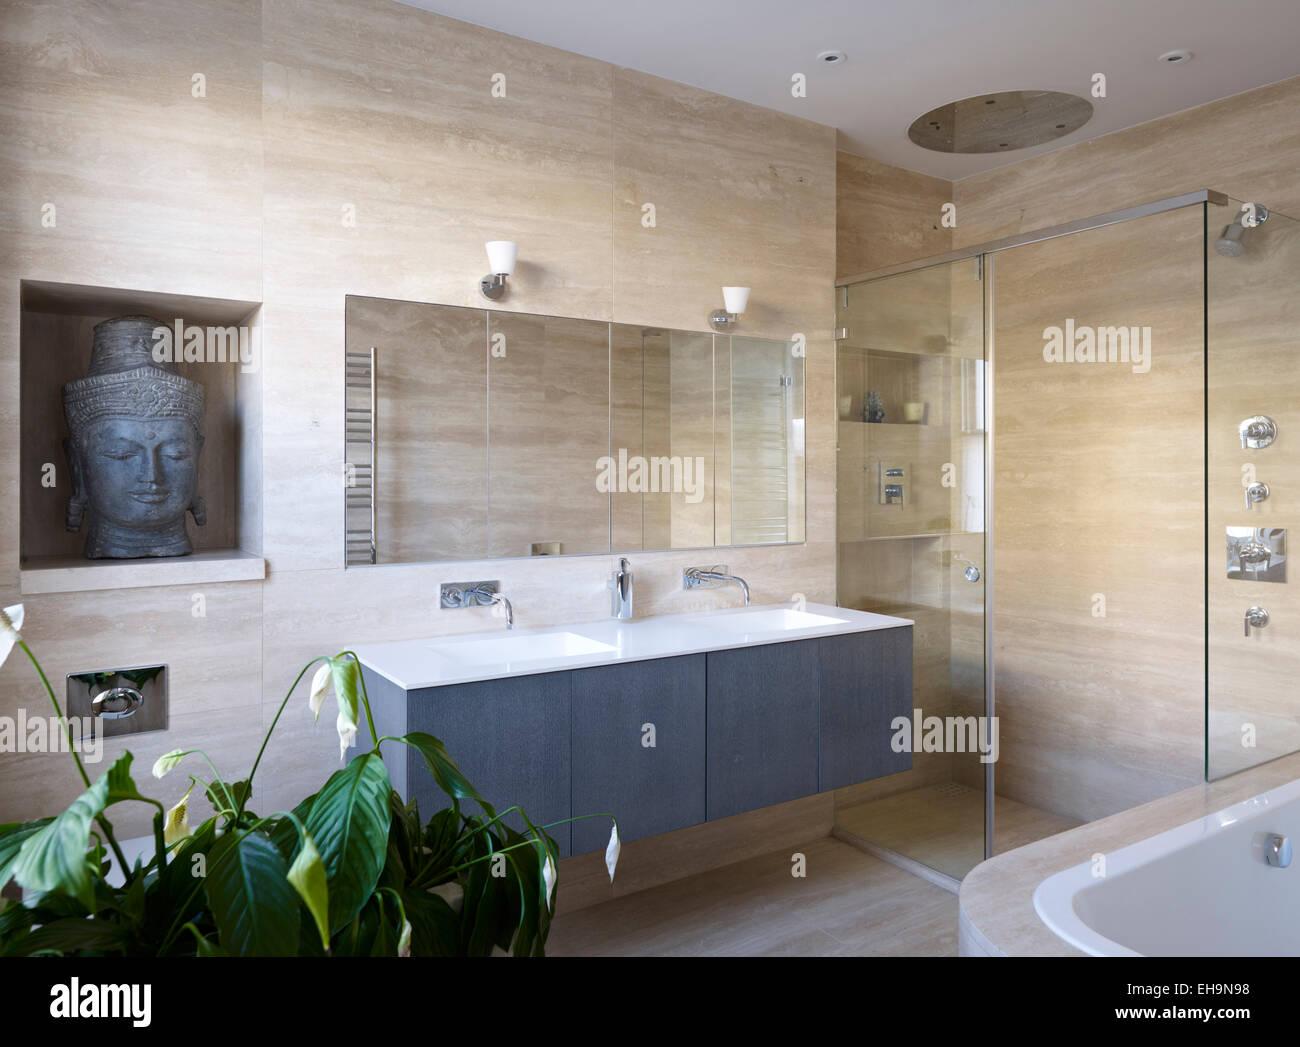 Bagni Con Doccia E Vasca Moderni : Sala da bagno sala da bagno visuale 3